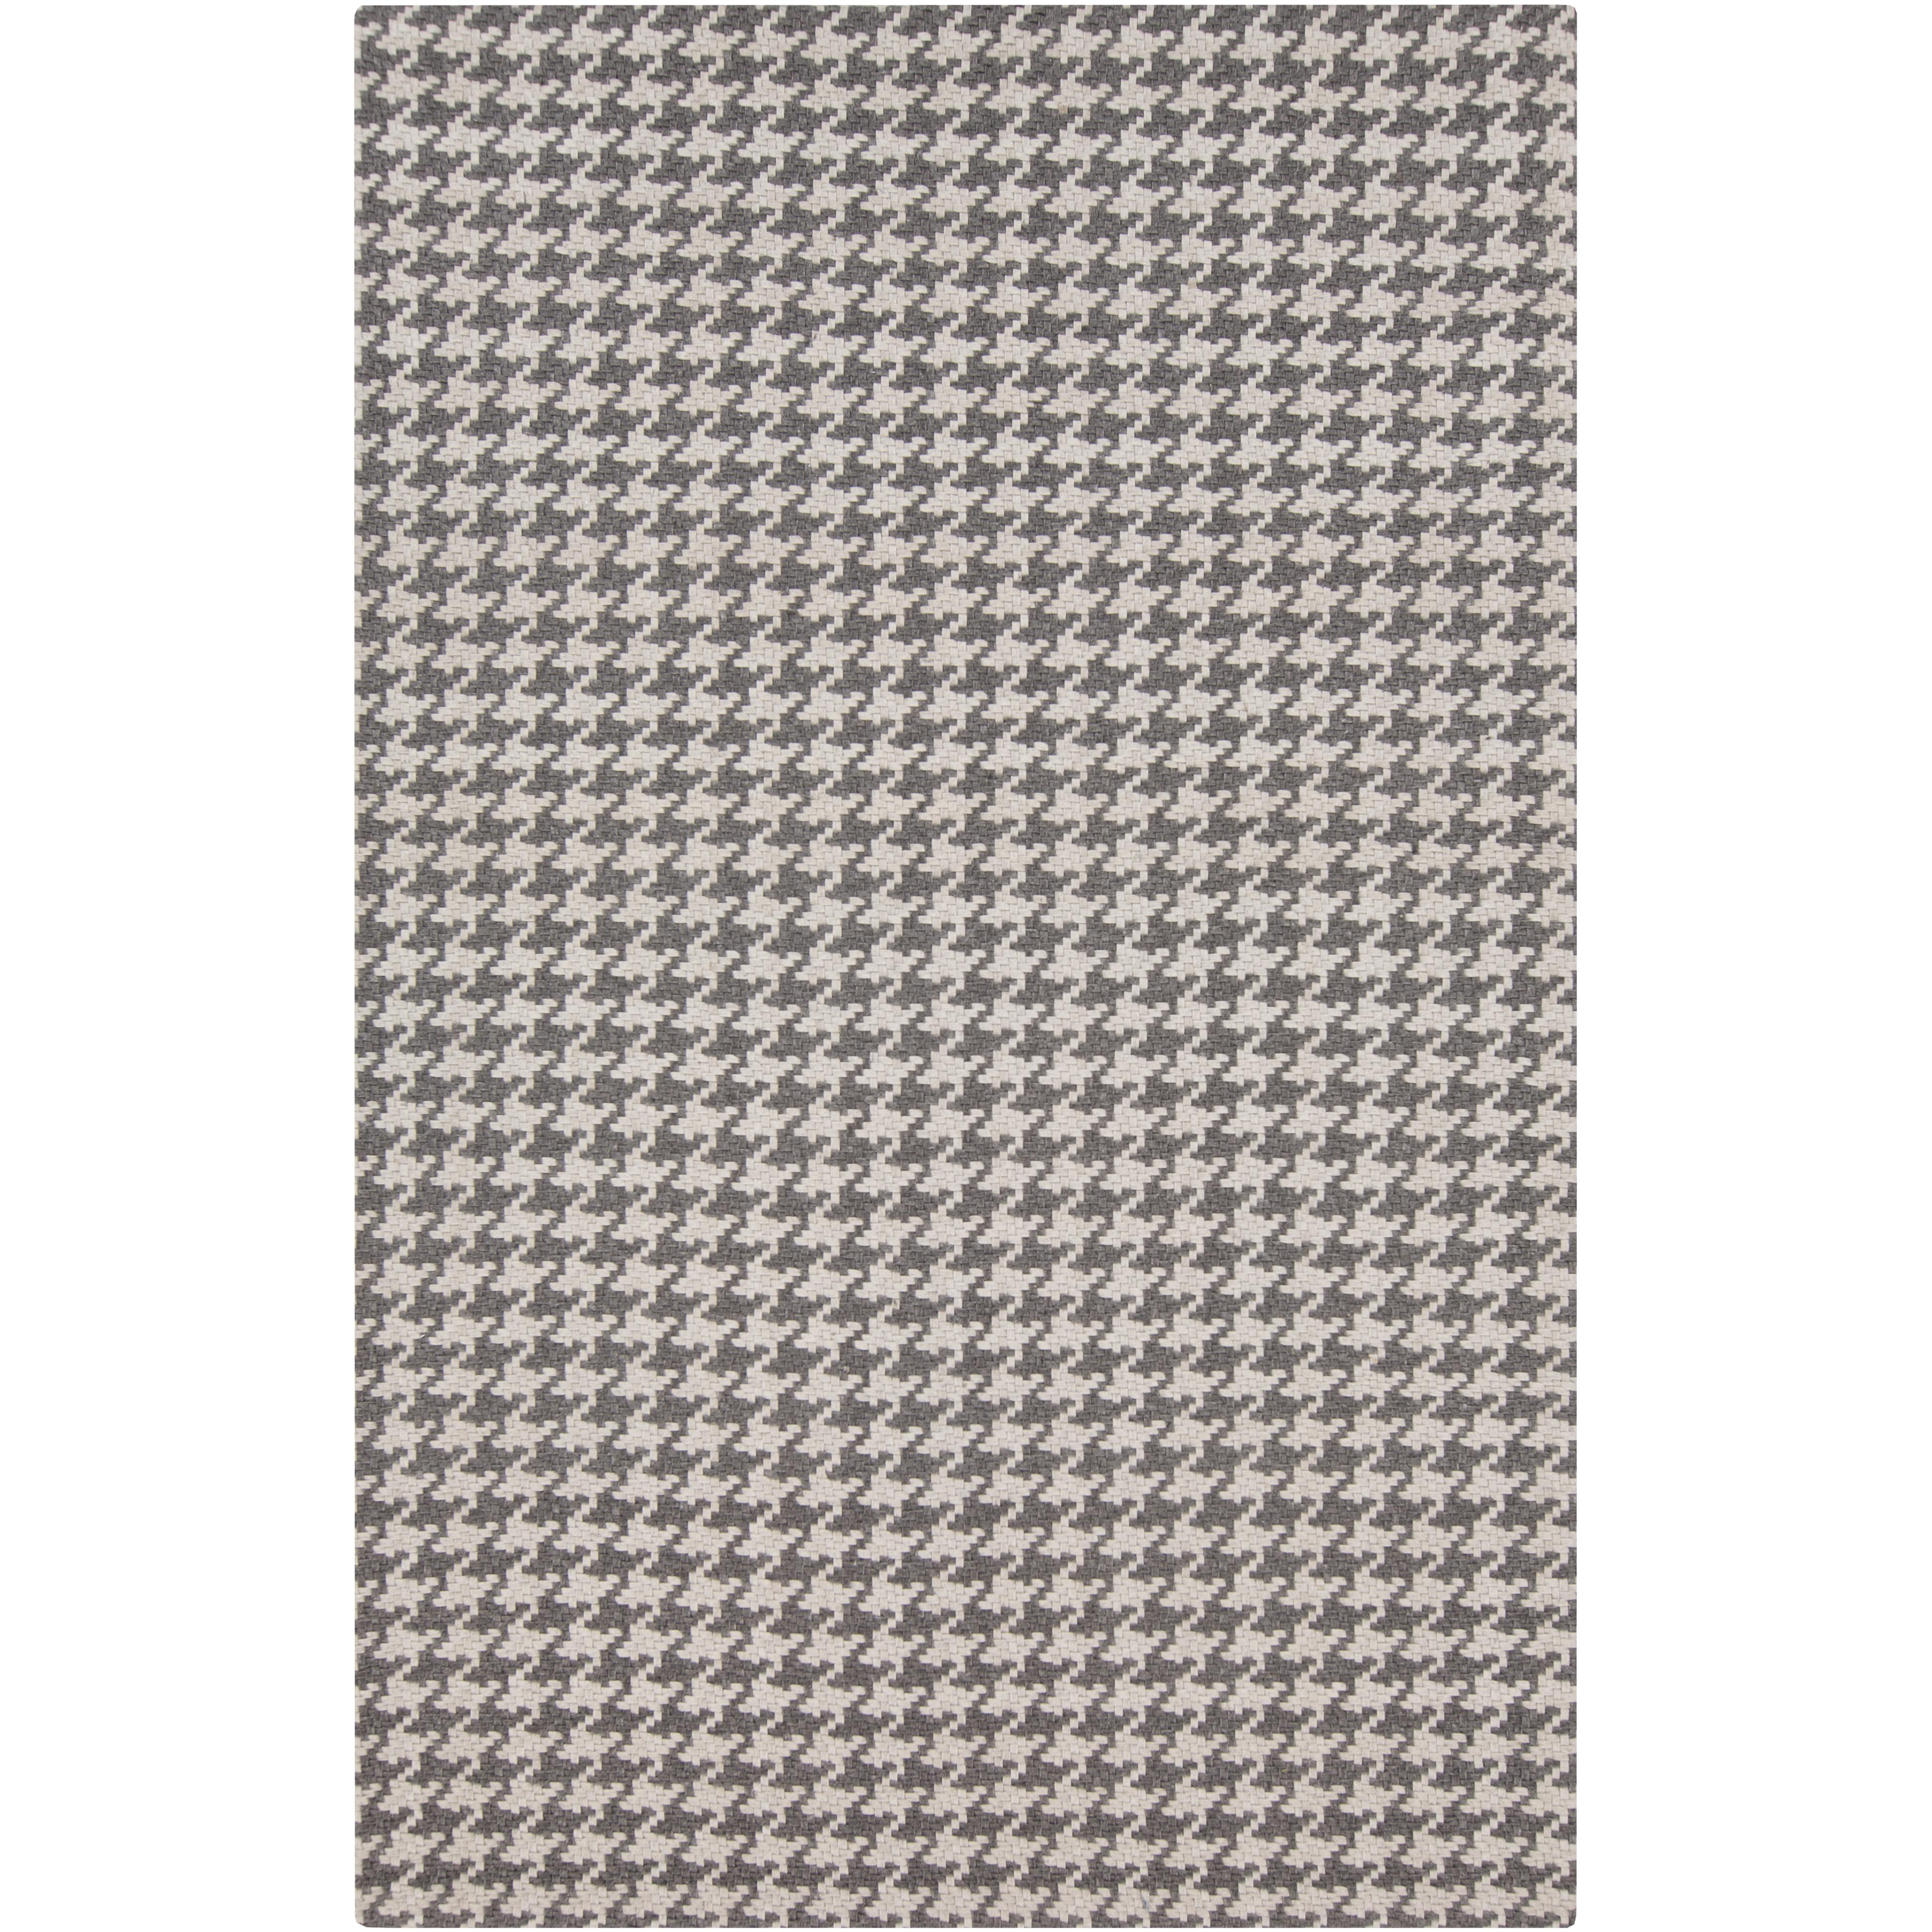 Surya Rugs Jigsaw 5' x 8' - Item Number: JIG1000-58